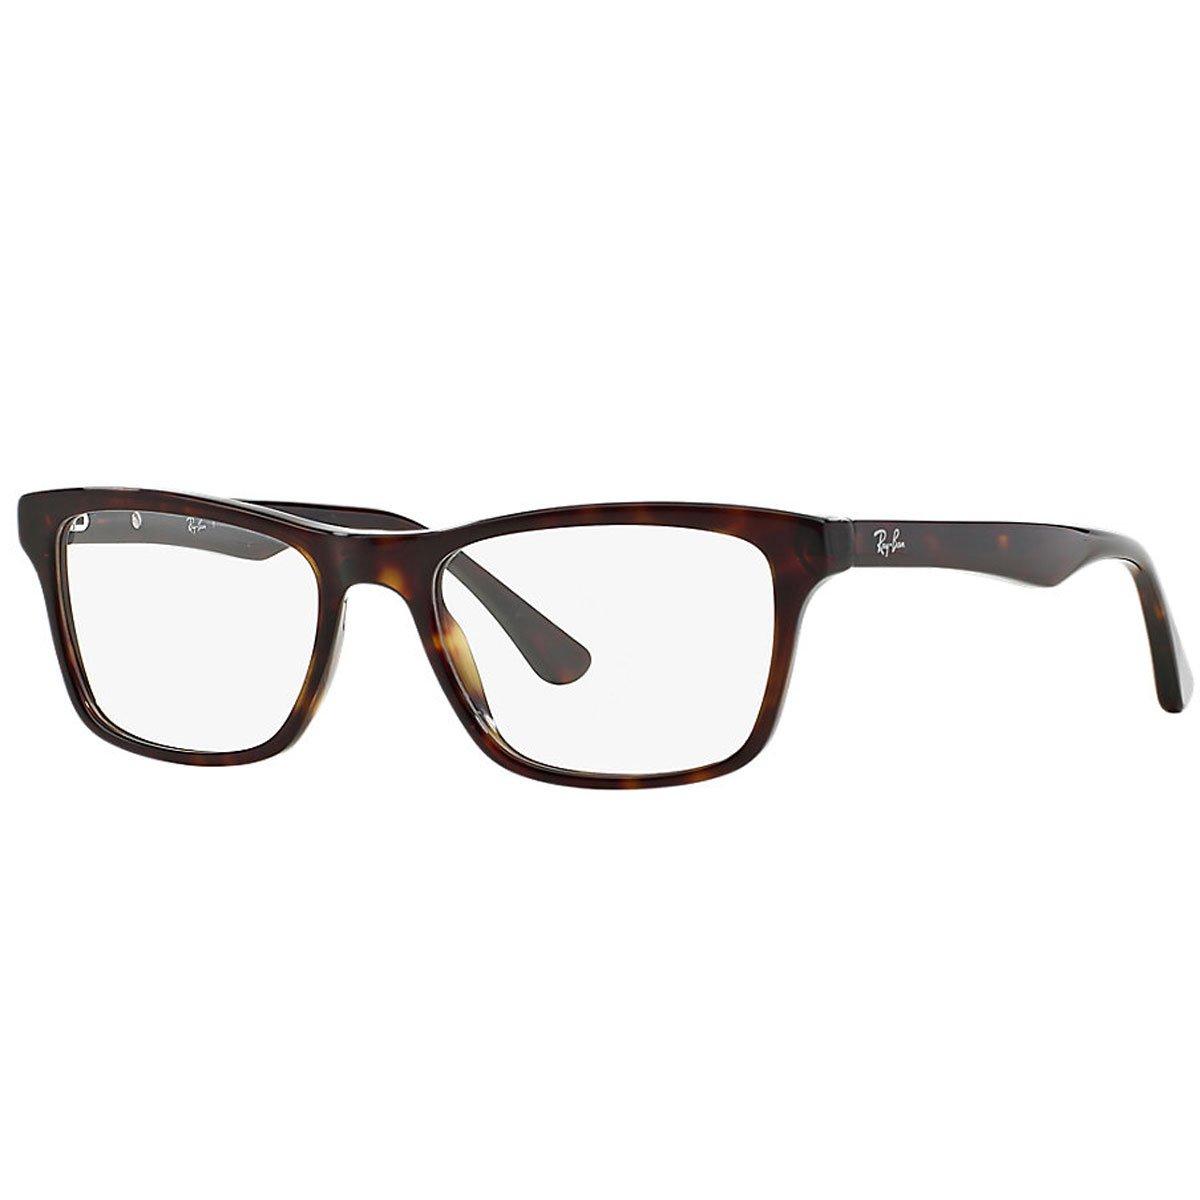 6e8b4c19475 Amazon.com  Eyeglasses Ray-Ban Optical RX 5279 2012 DARK HAVANA  Shoes